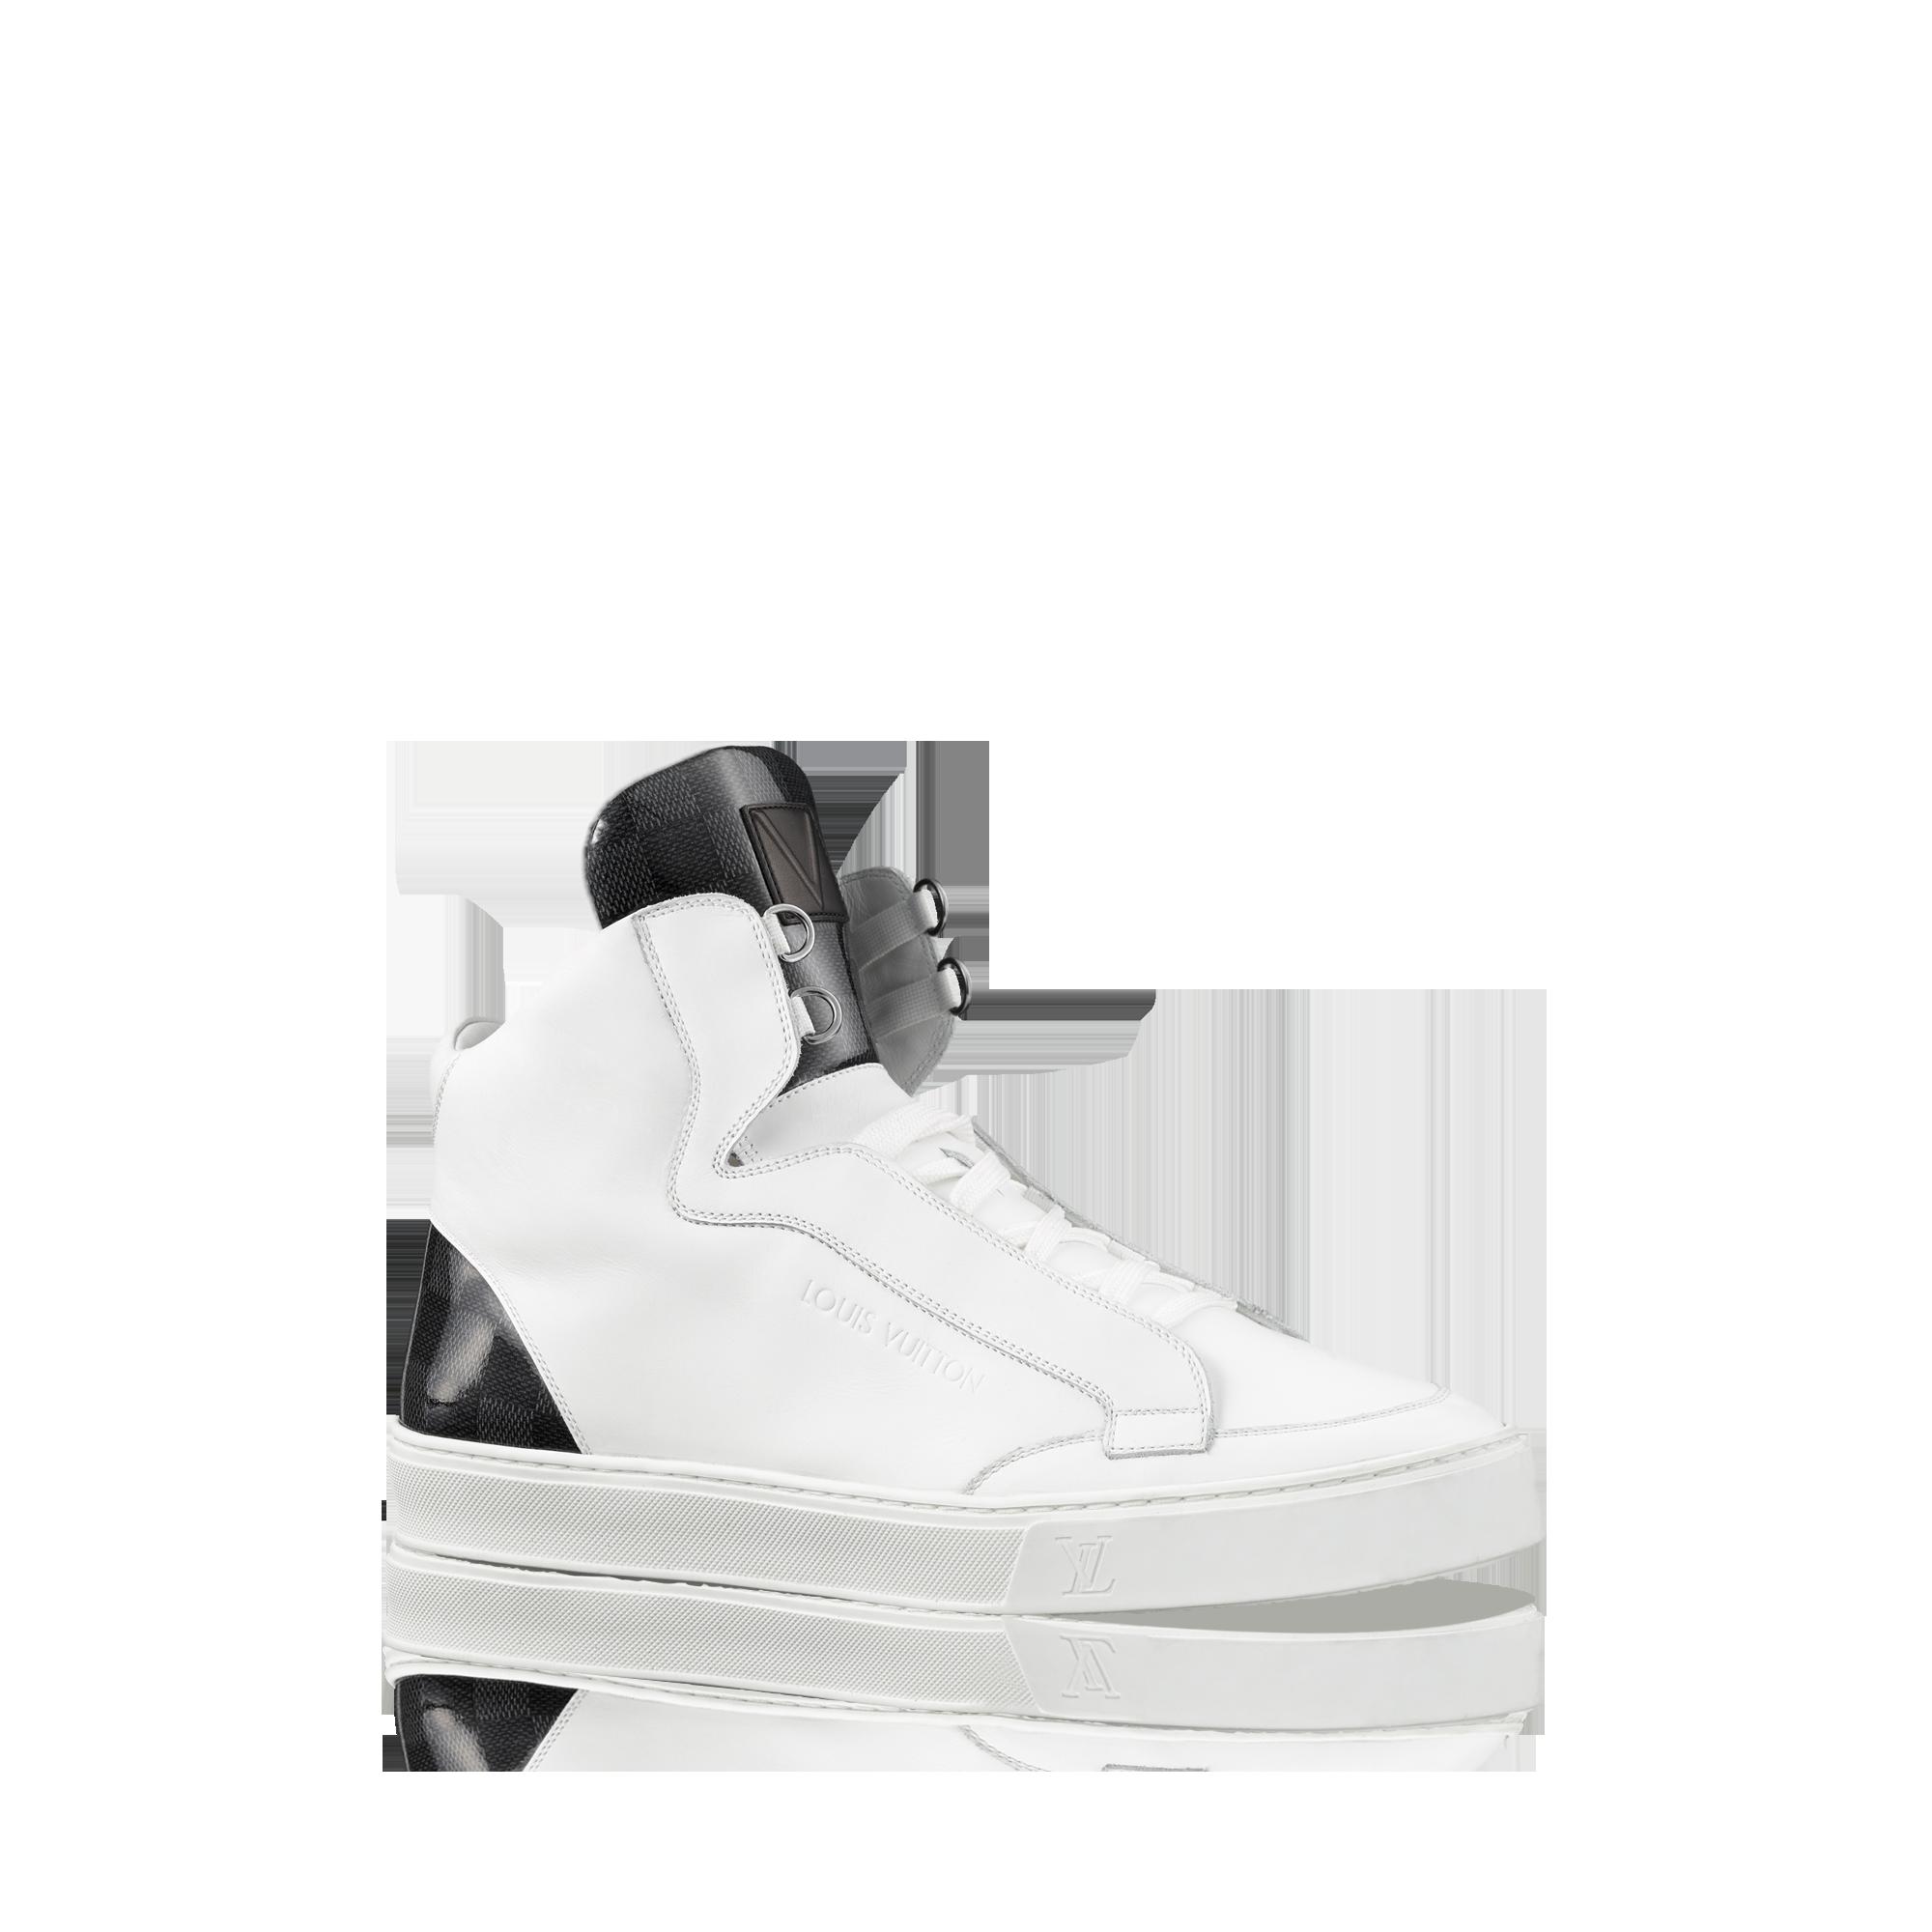 adacbd1ad3f Louis Vuitton Speaker Sneaker Boot from LV Online #LouisVuitton ...